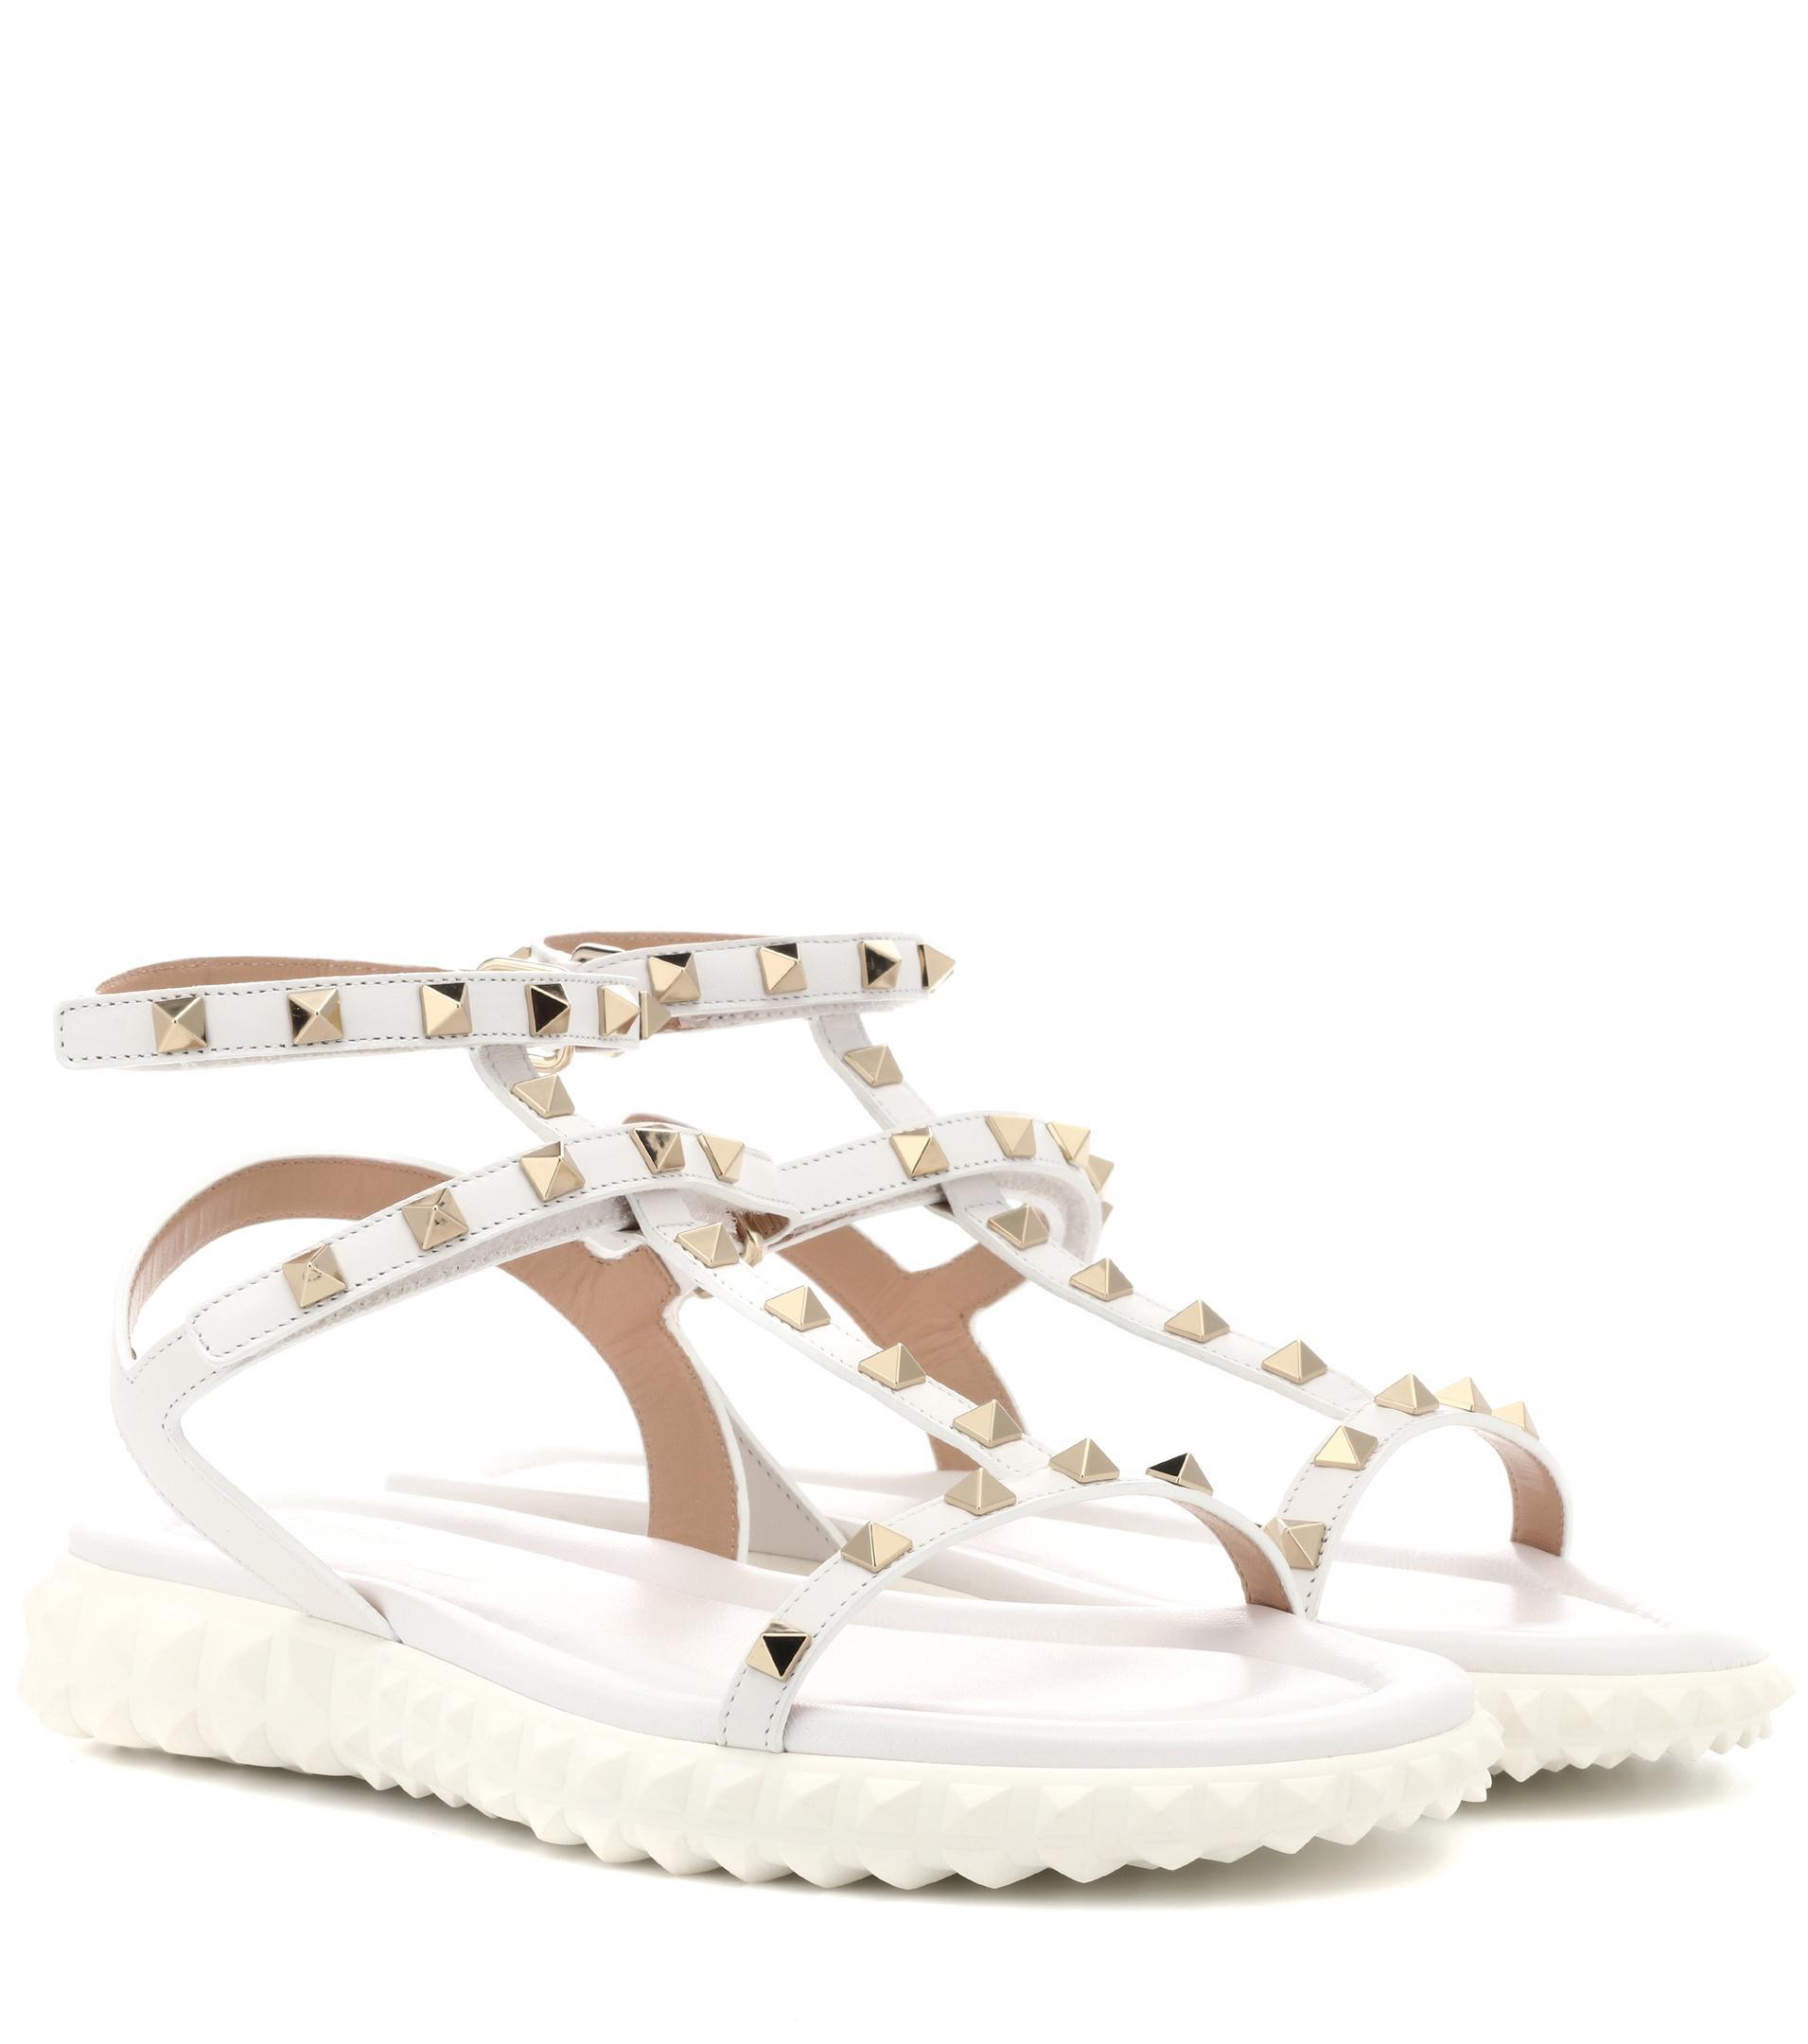 f993bd1a8e2e Valentino Free Rockstud Leather Sandals in White - Lyst